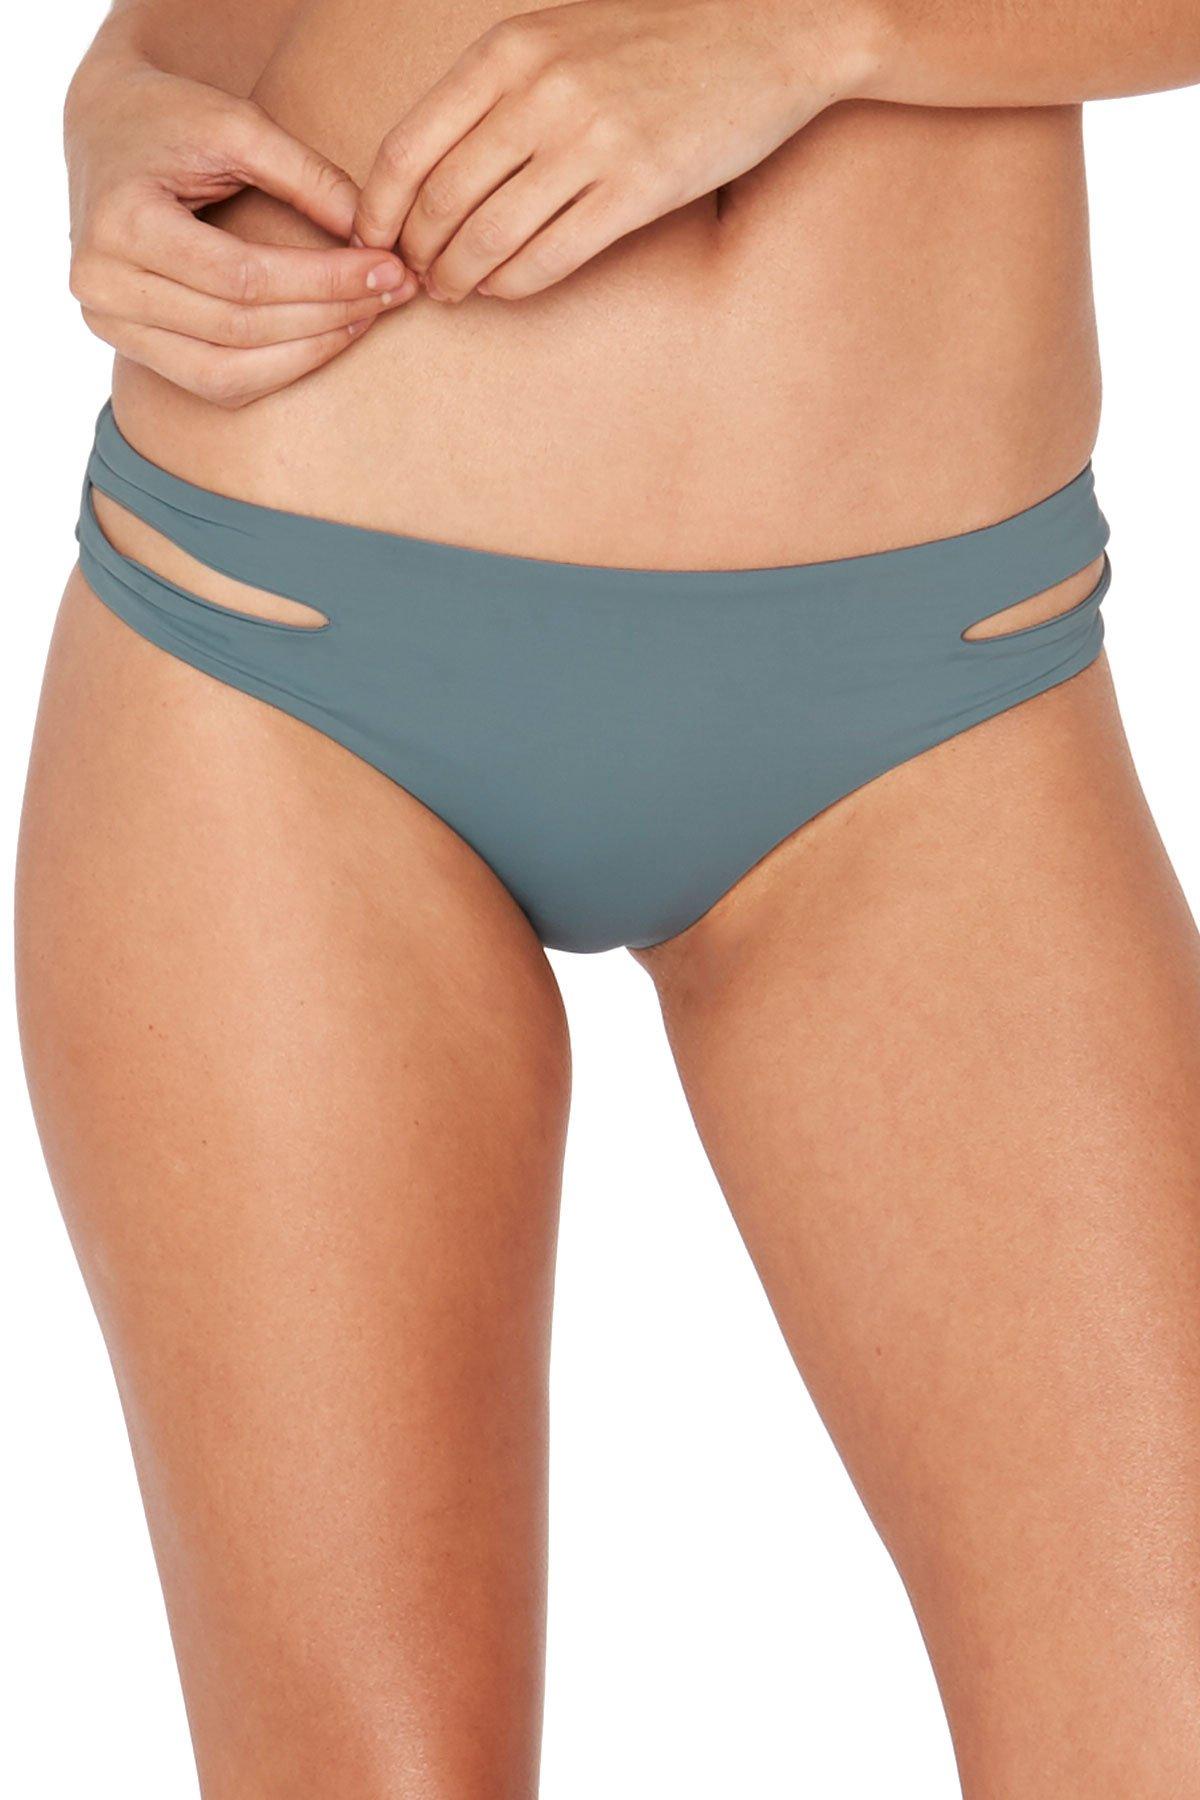 LSpace Women's LSolids Tab Side Hipster Bikini Bottom (Full) Slated Glass L